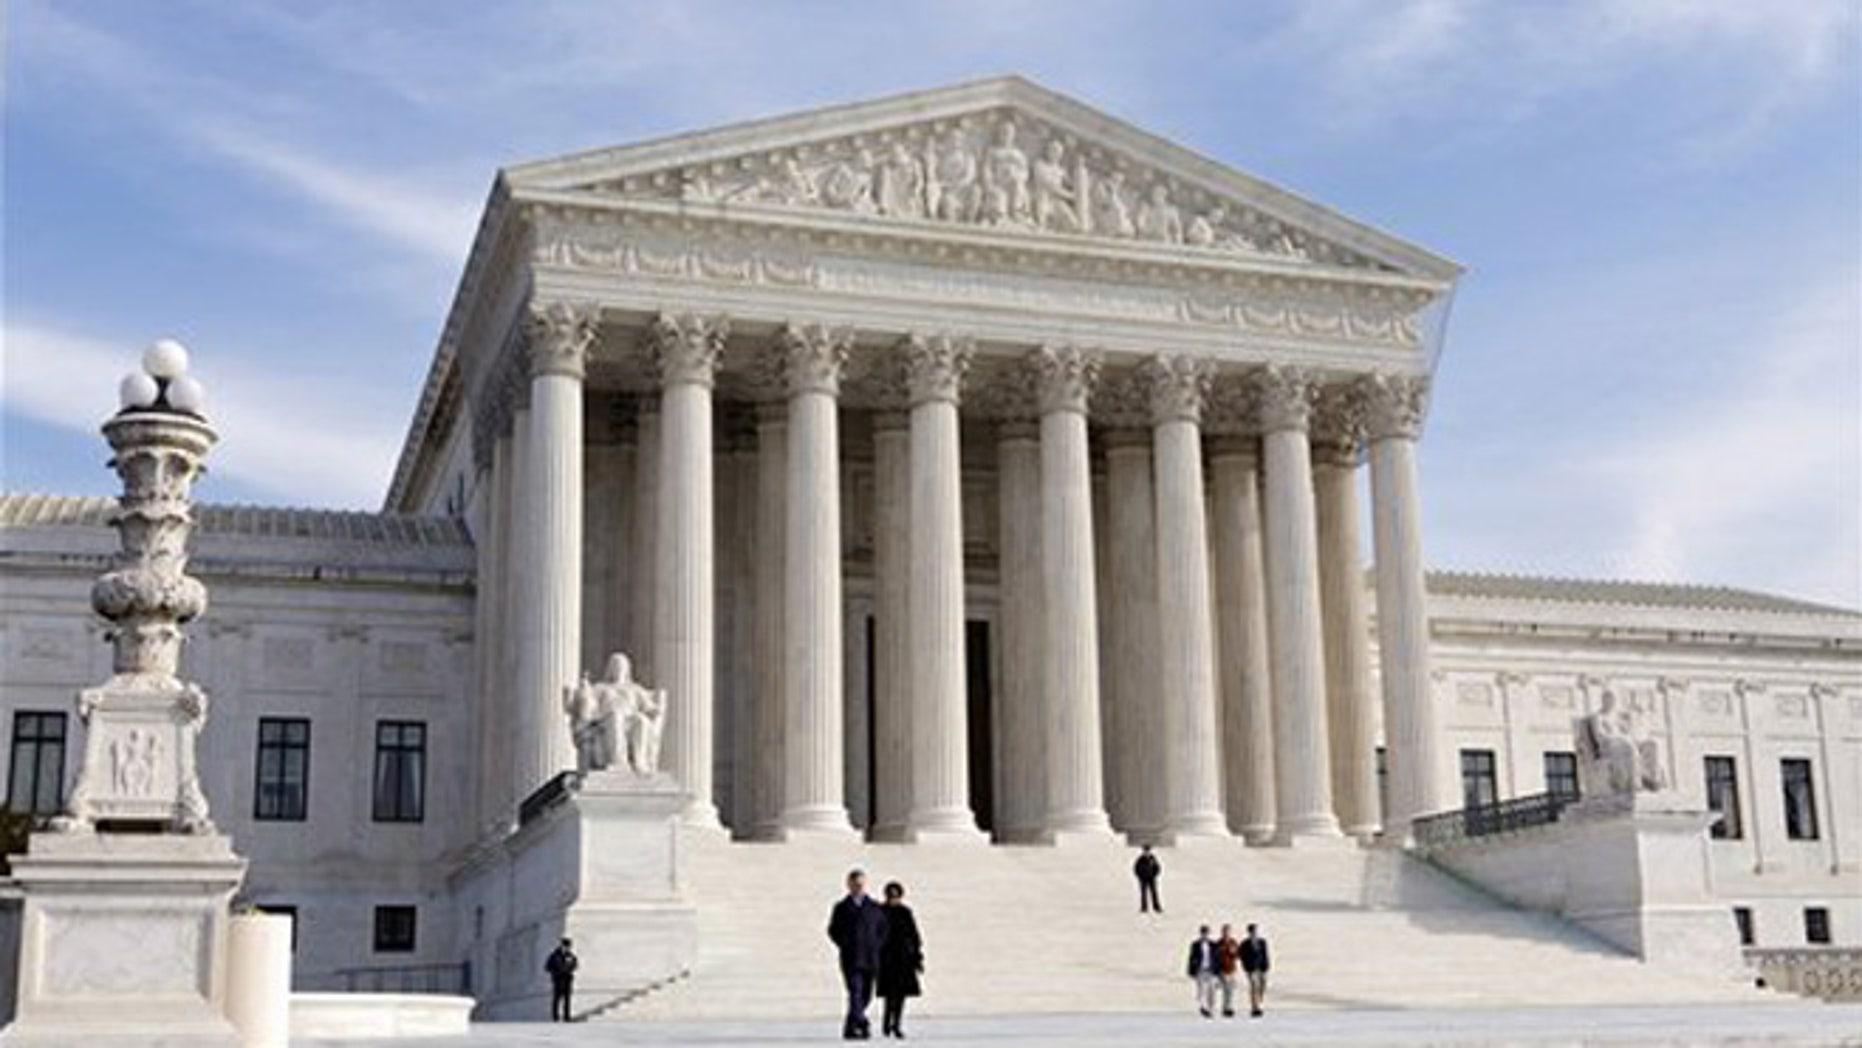 U.S. Supreme Court Building in Washington. (Associated Press)